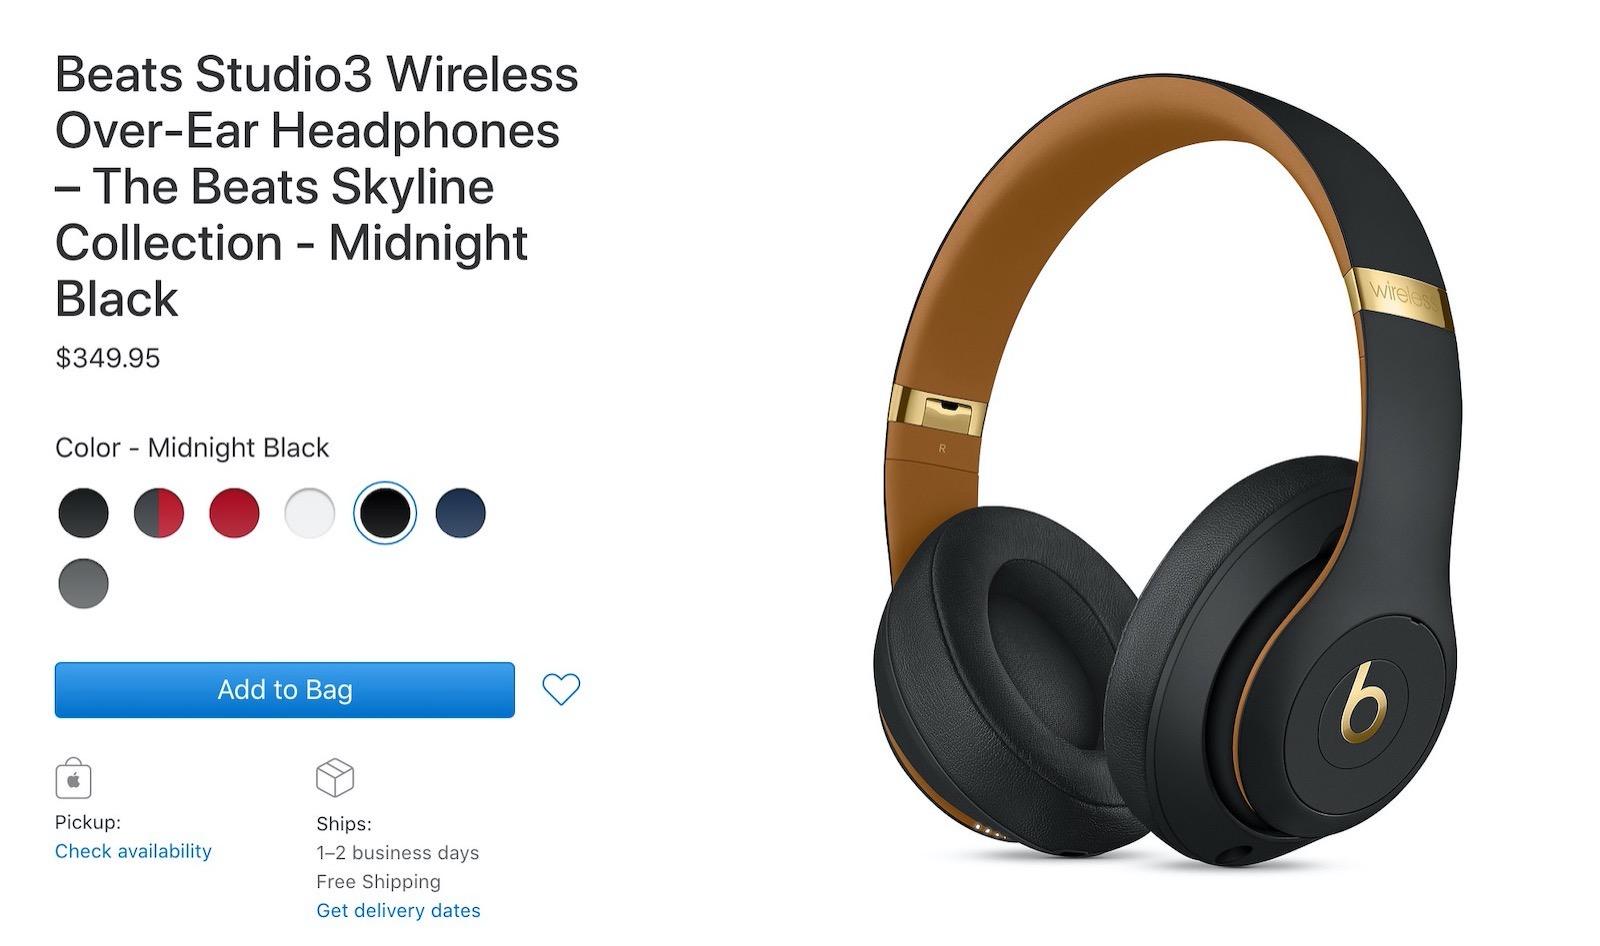 beats-studio3-wireless-headphones-the-beats-skyline-collection-midnight-black.jpg